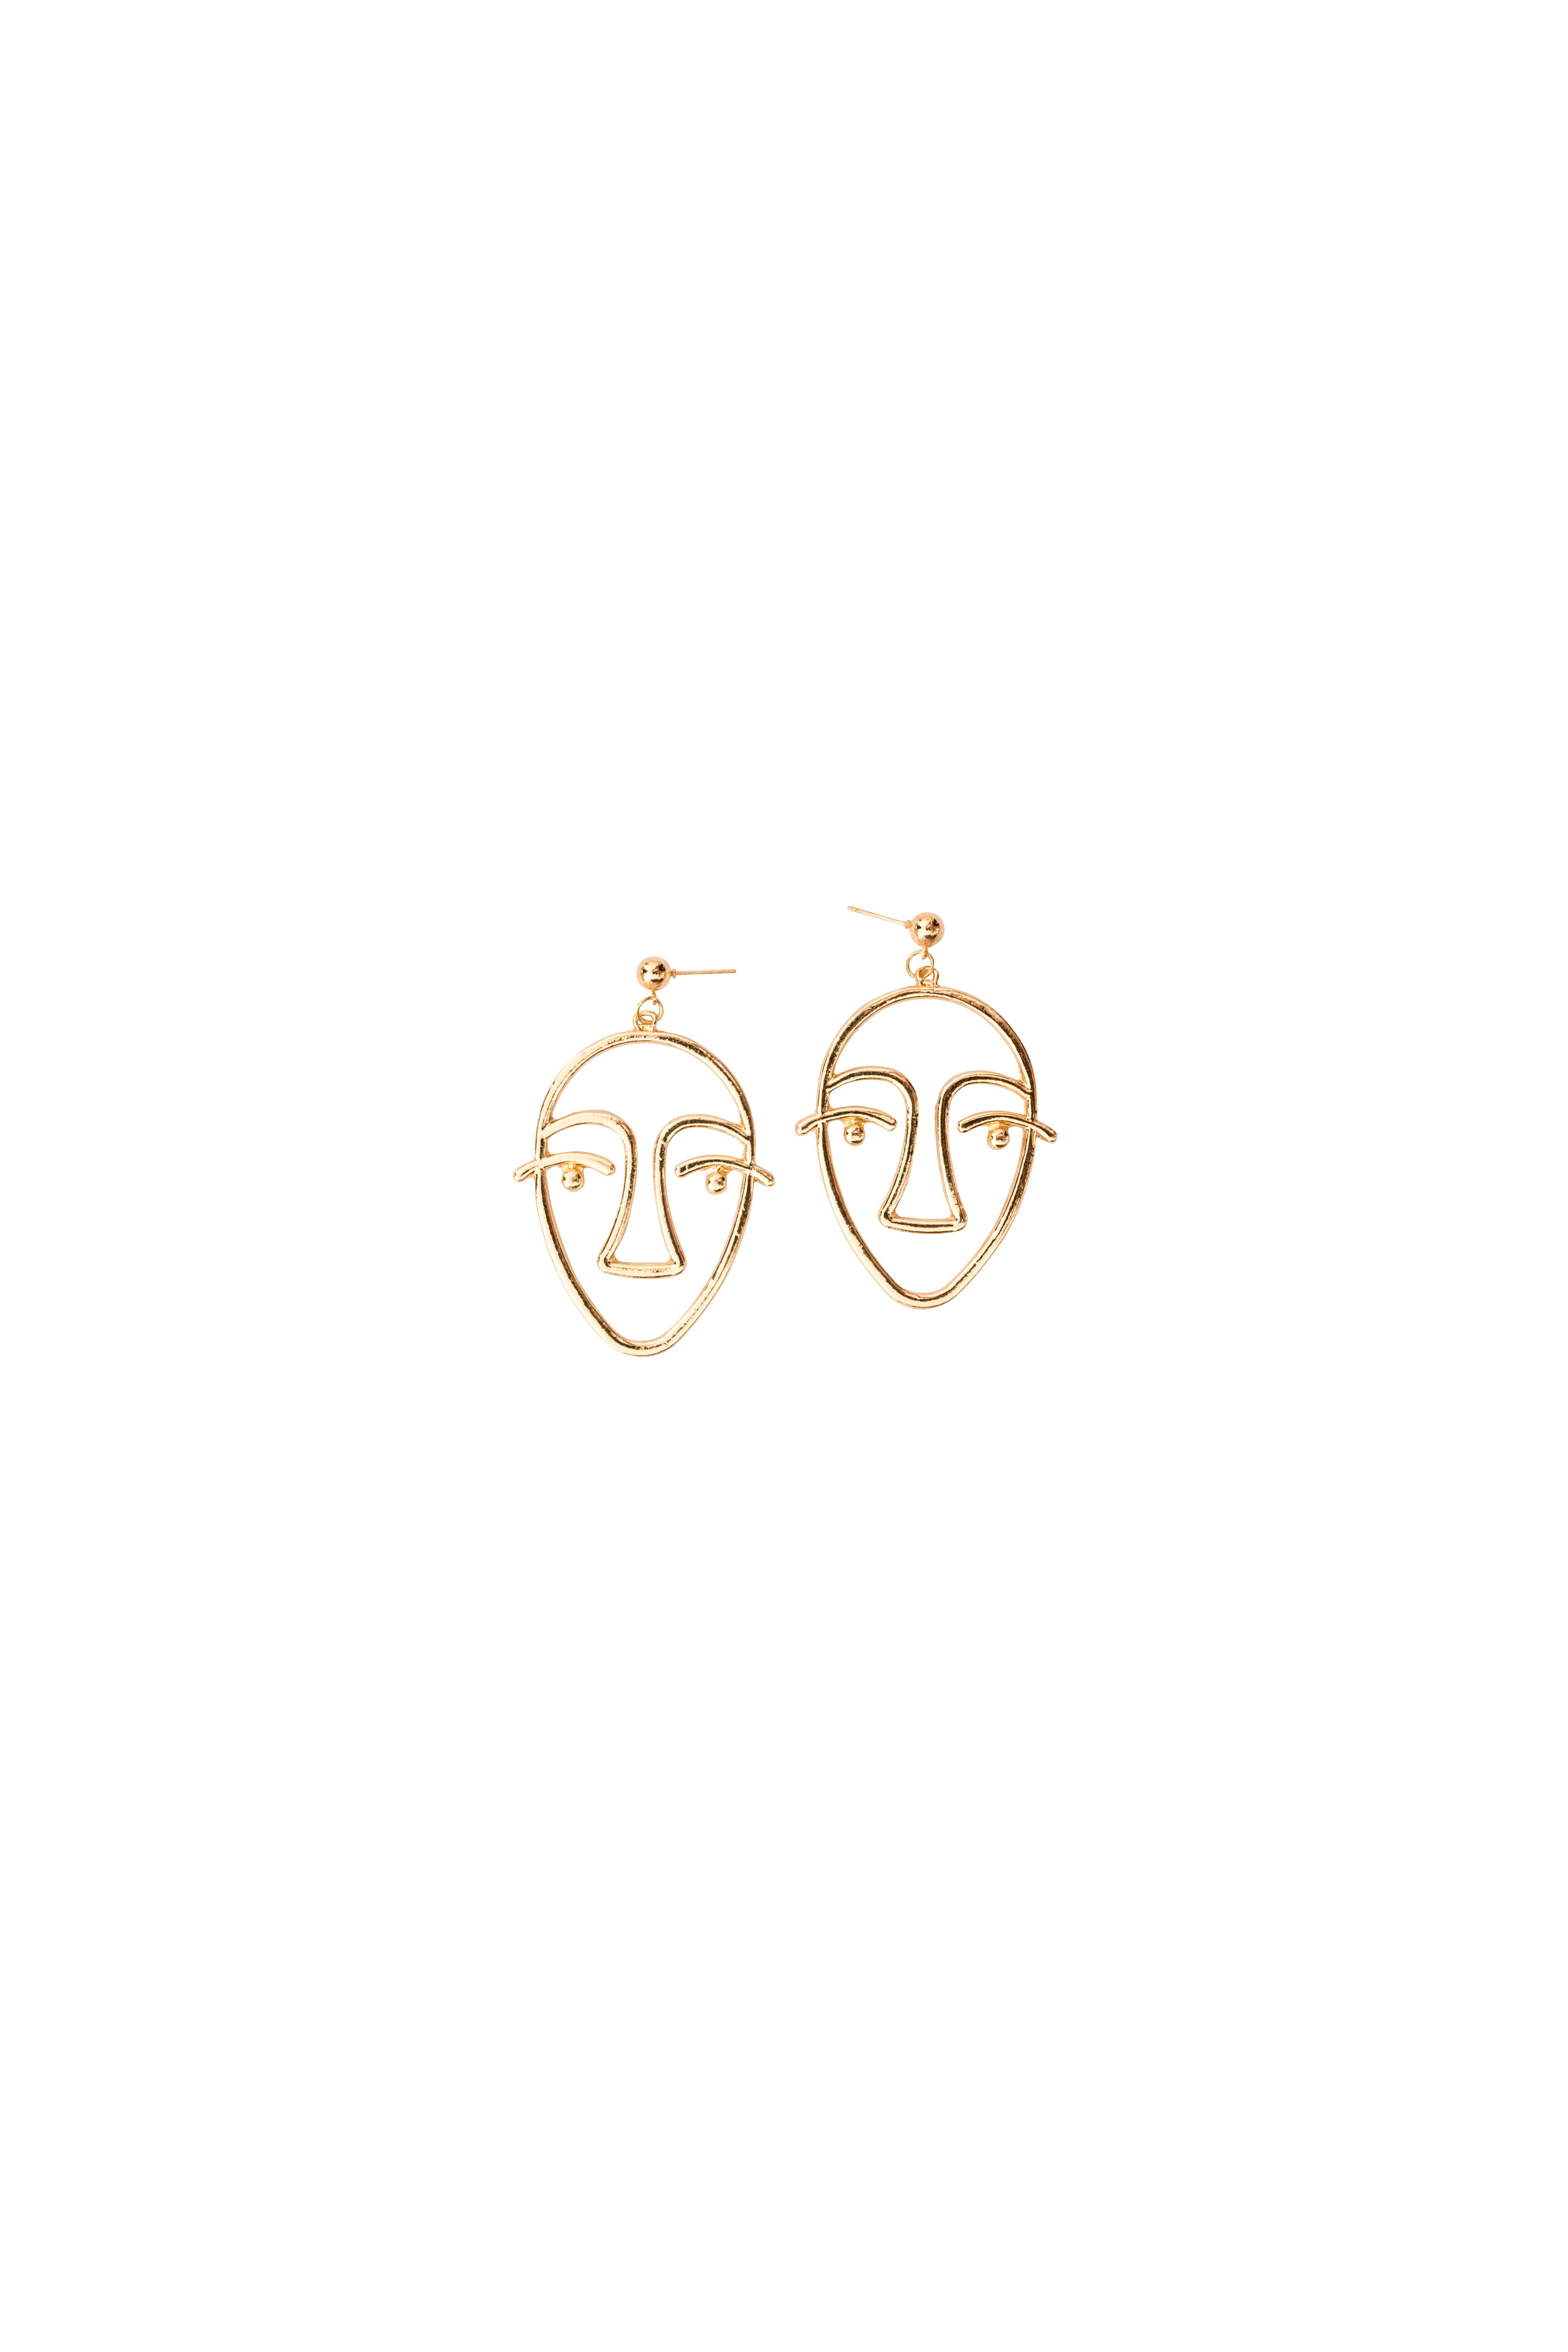 We-Are-Flowergirls-Spring-Summer-Collection-Earring-Tassel-€21[L1140666].jpg